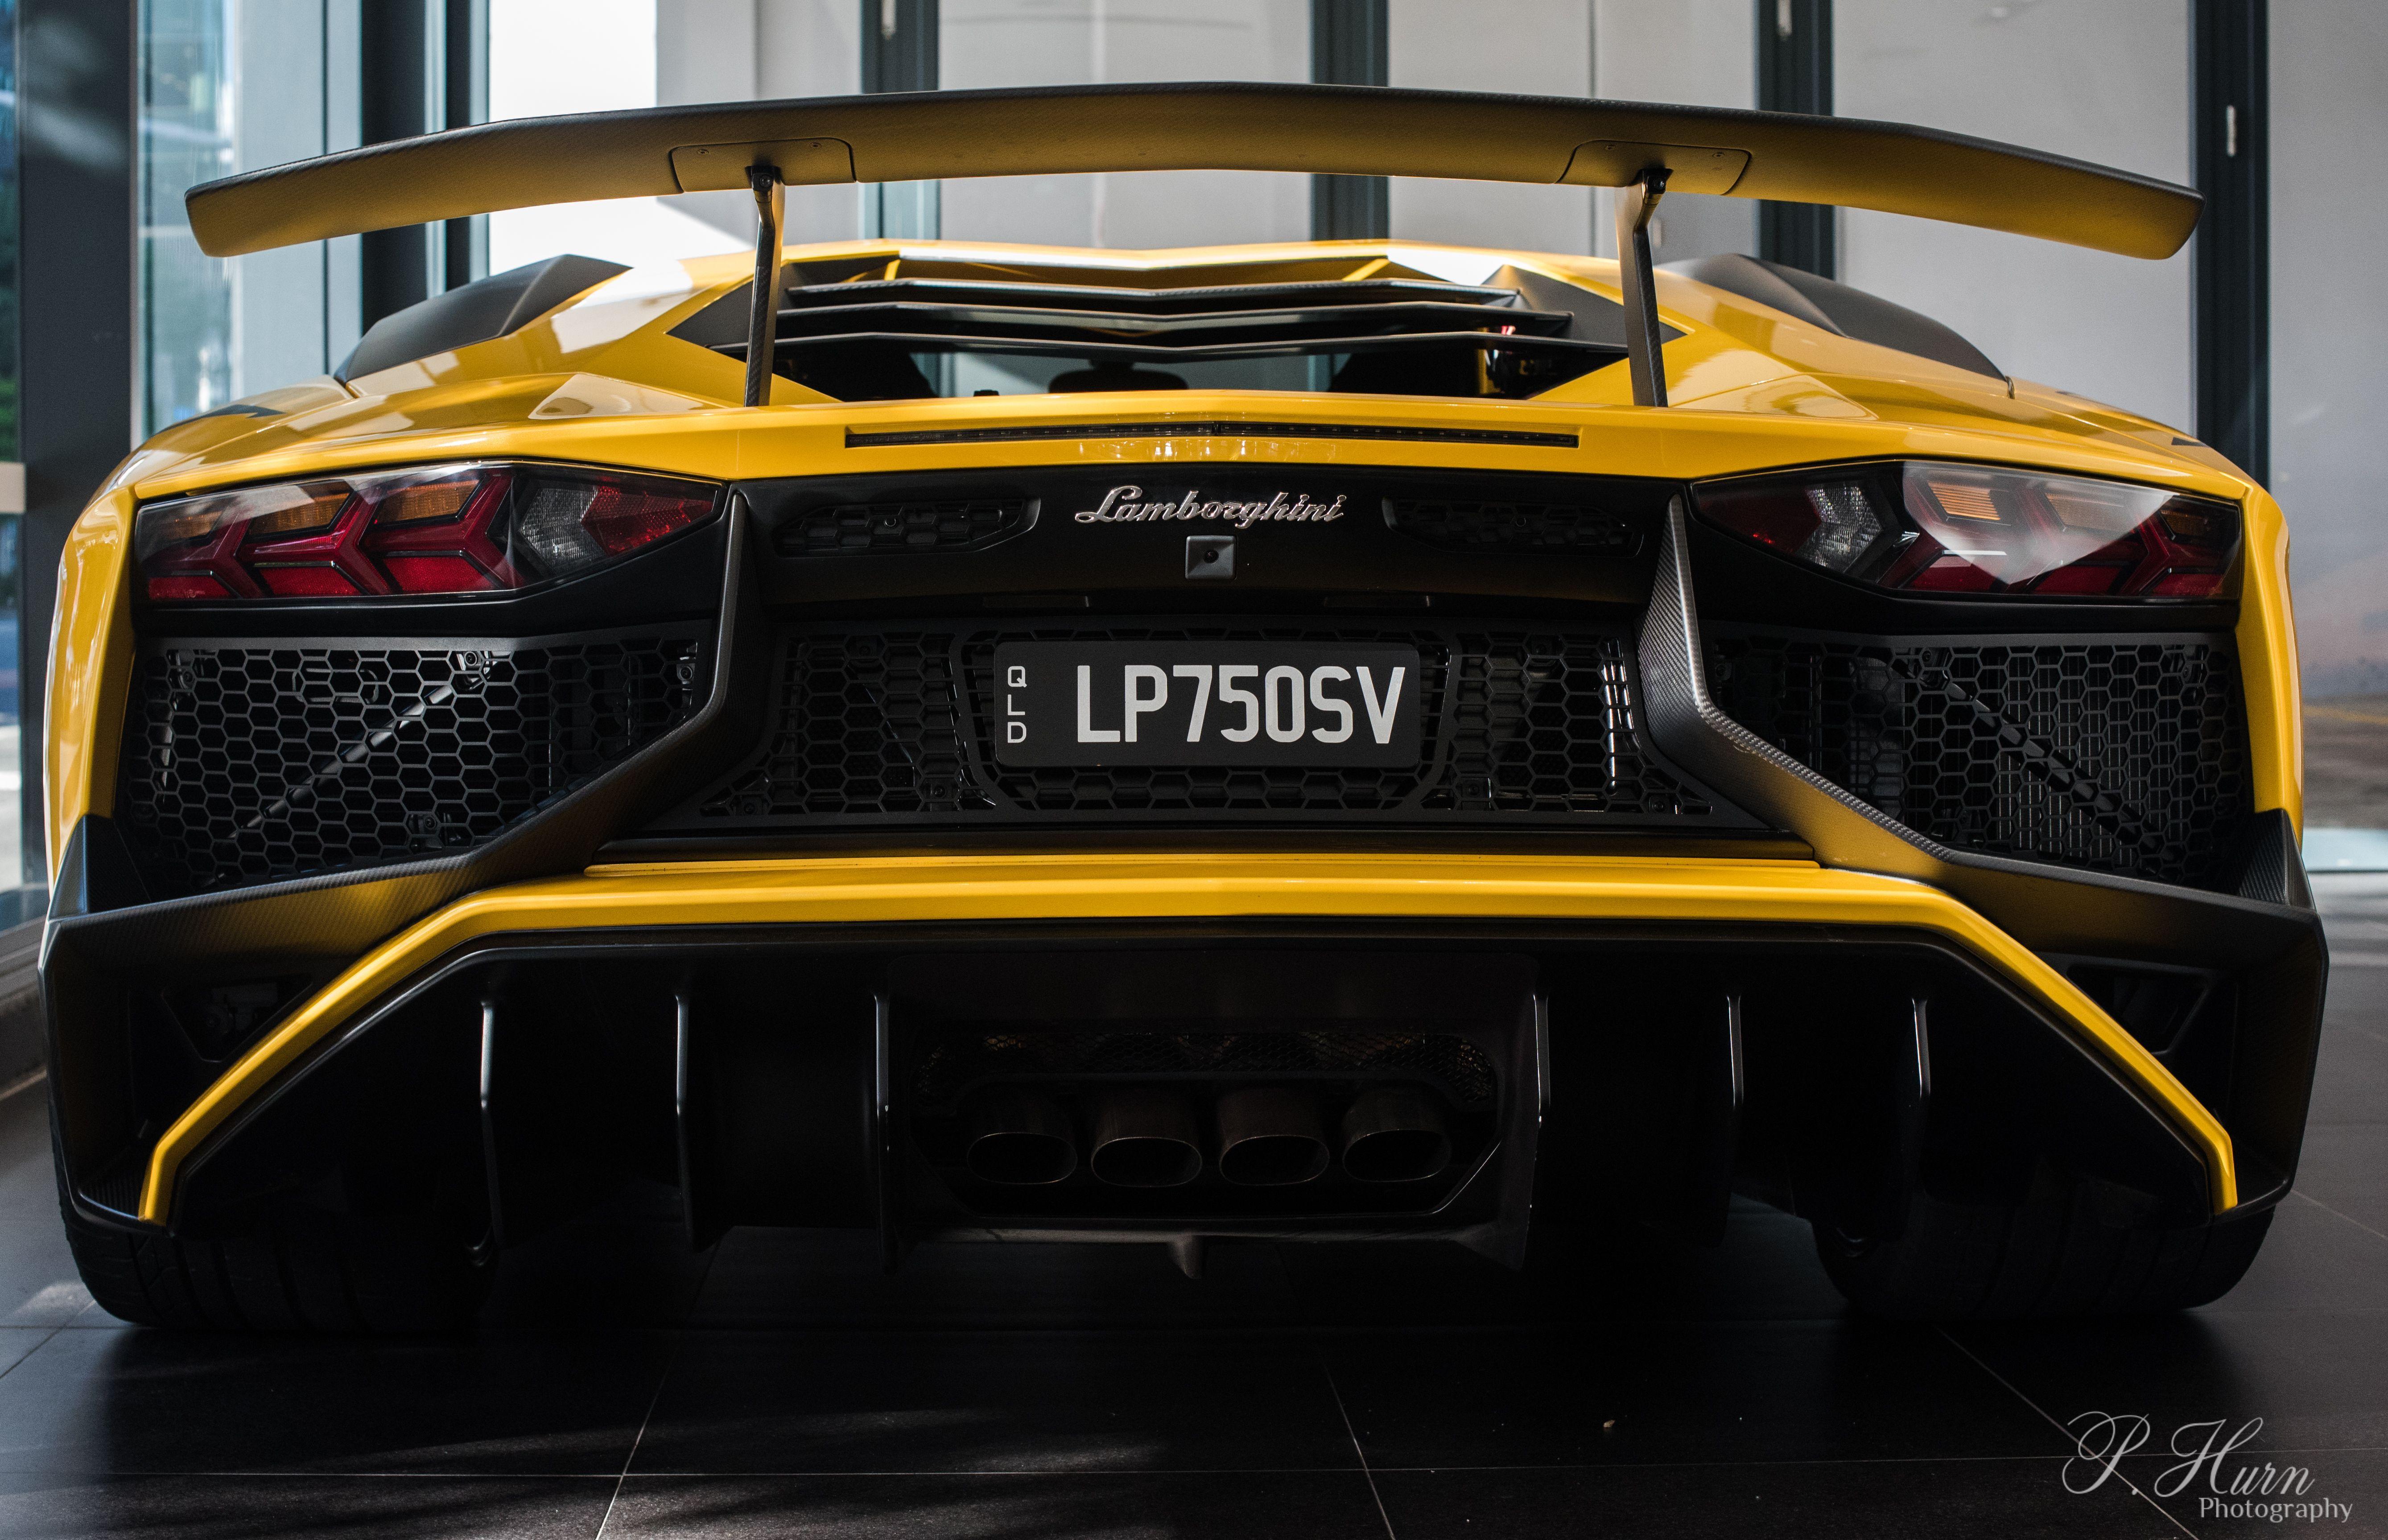 Lamborghini SV Rear Love #lamborghinisv Lamborghini SV Rear Love #lamborghinisv